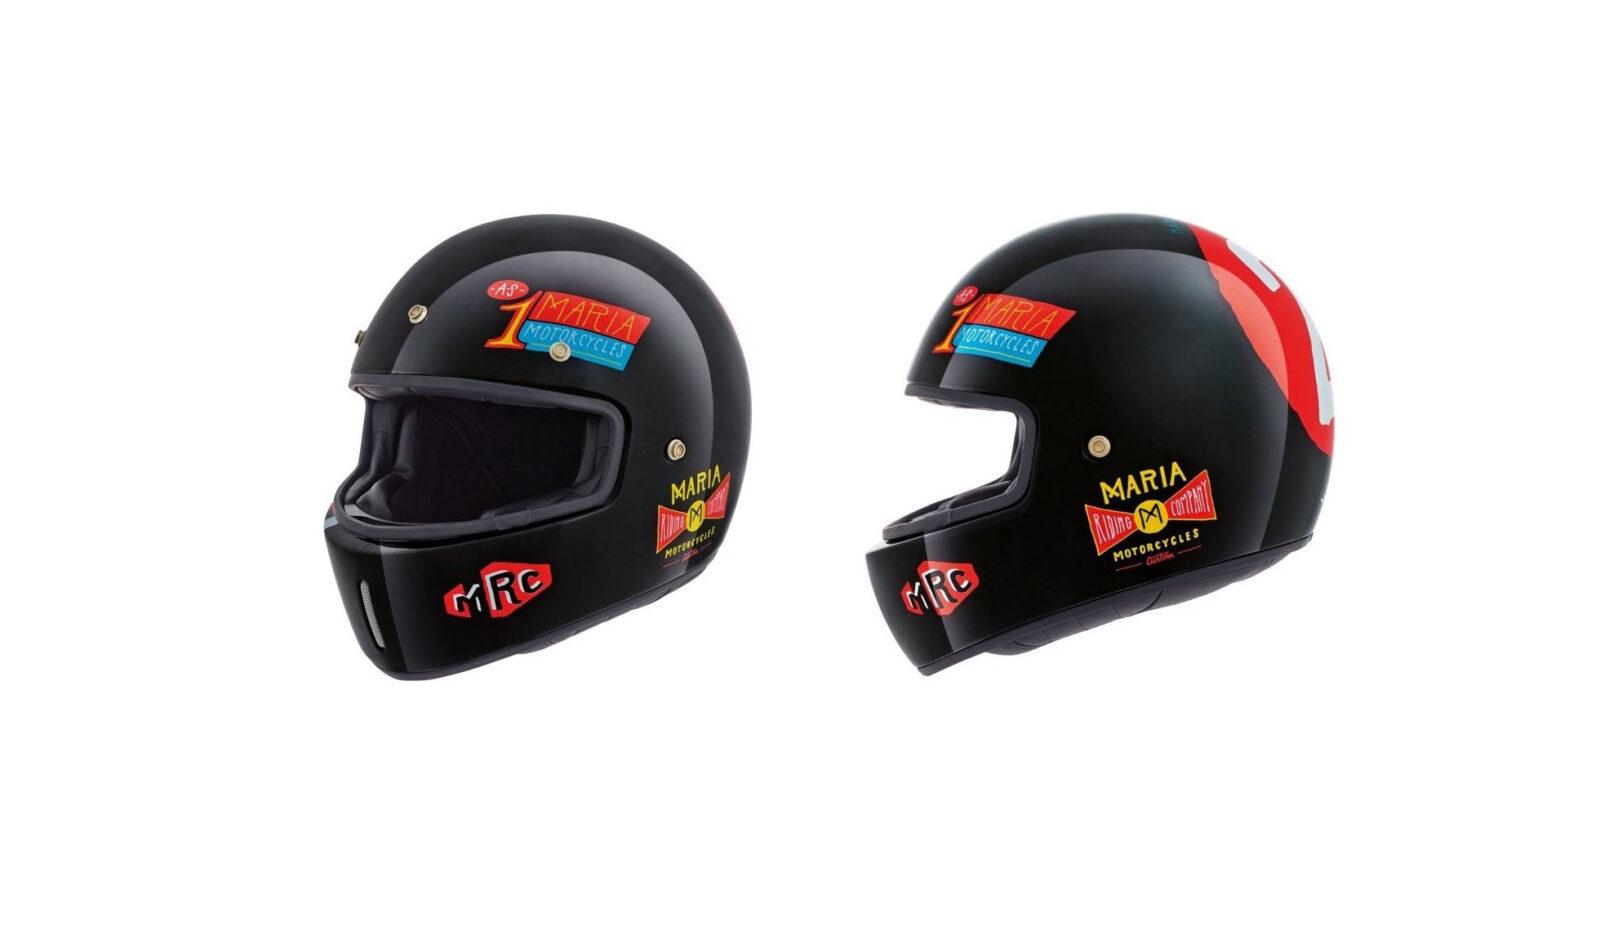 Nexx XG100 Bad Loser Helmet 1600x930 - Nexx XG100 Bad Loser Helmet